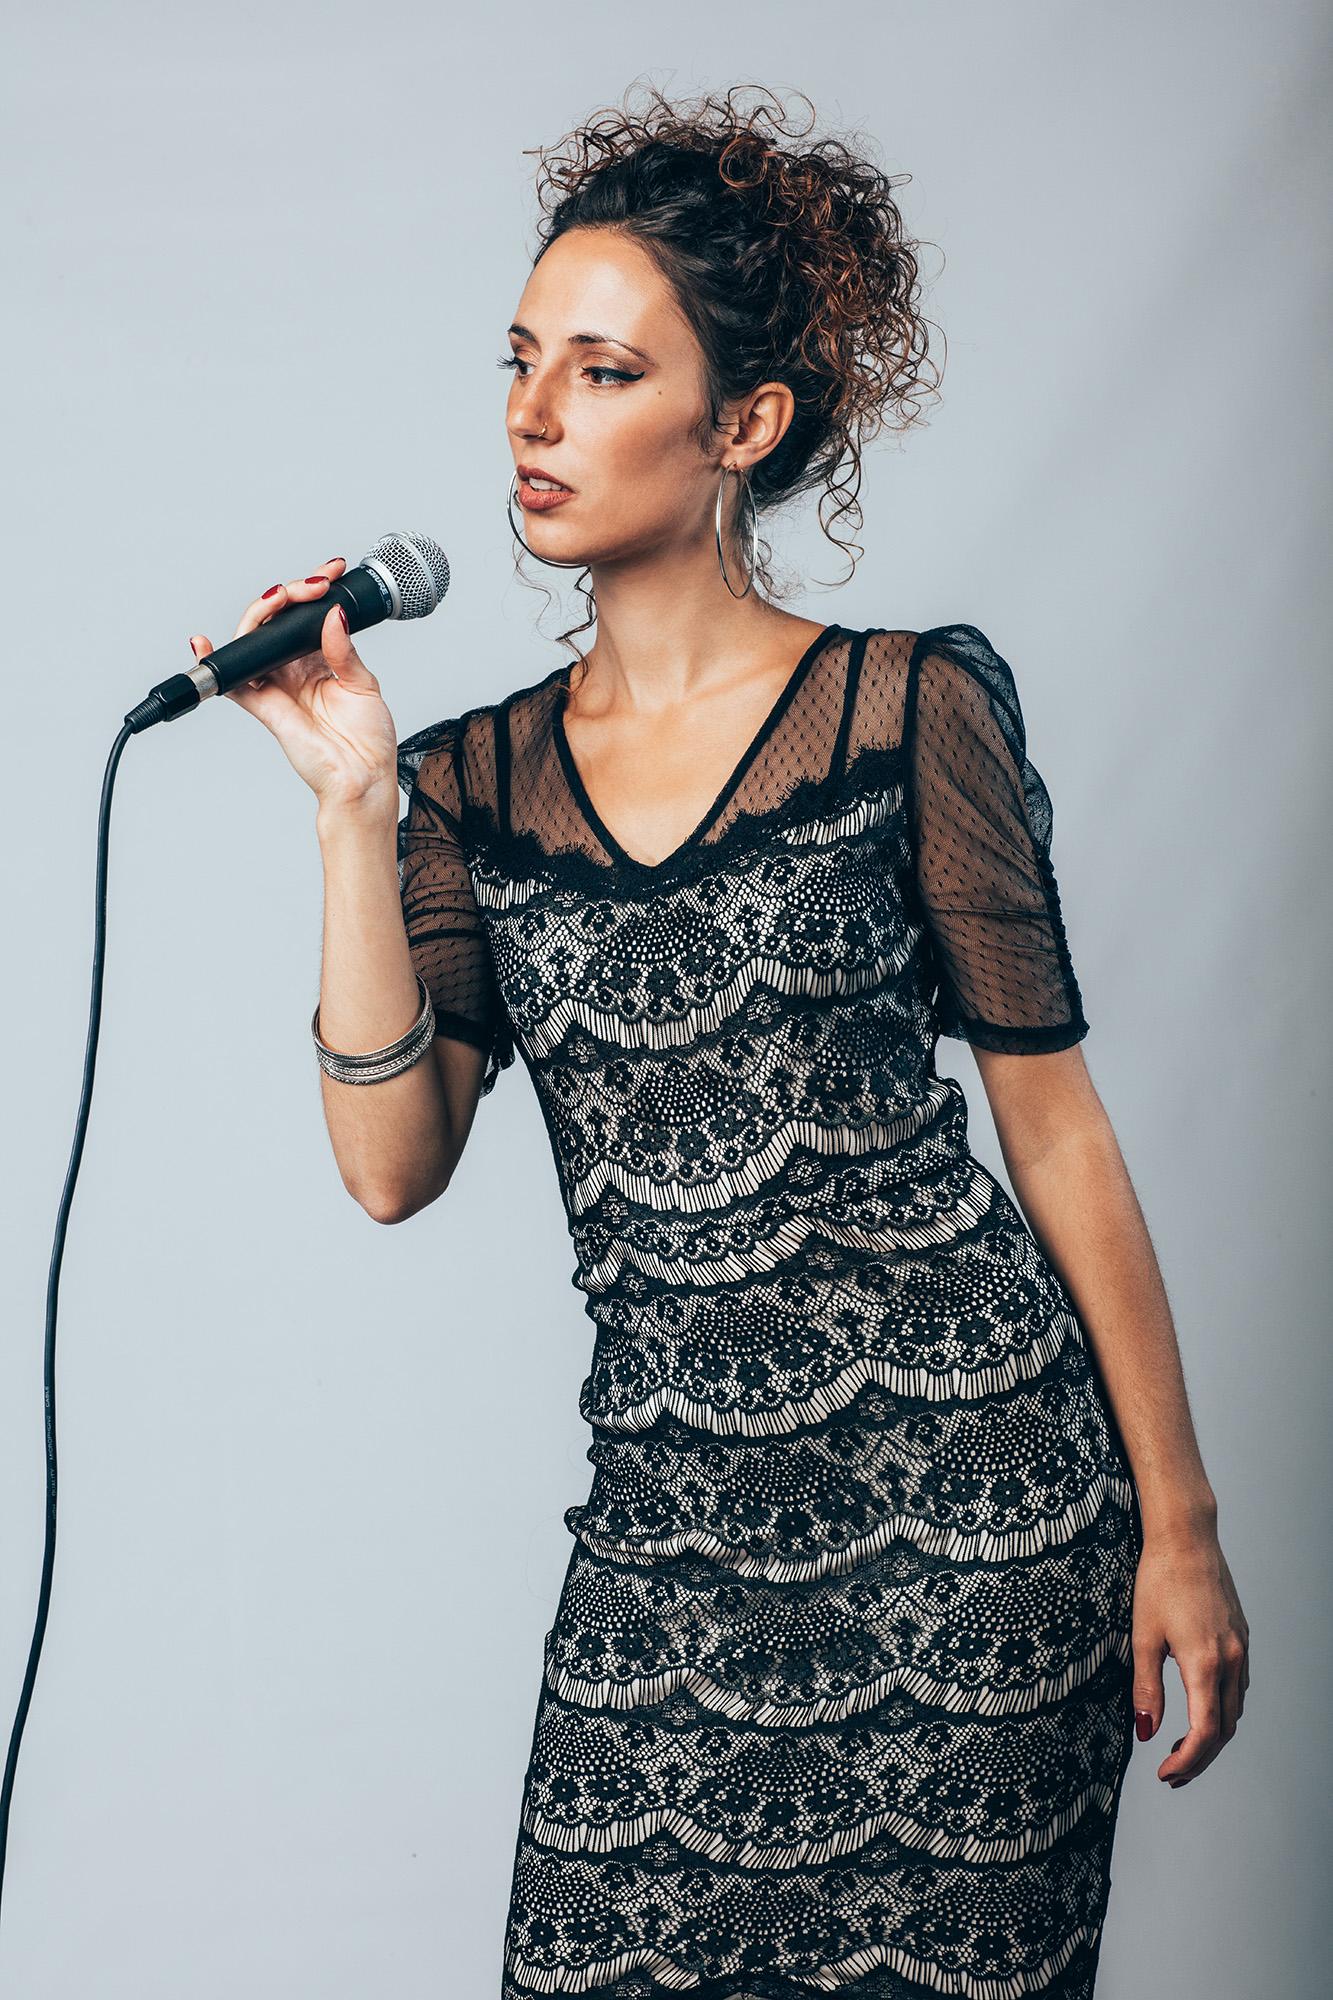 singer funk soul microphone events